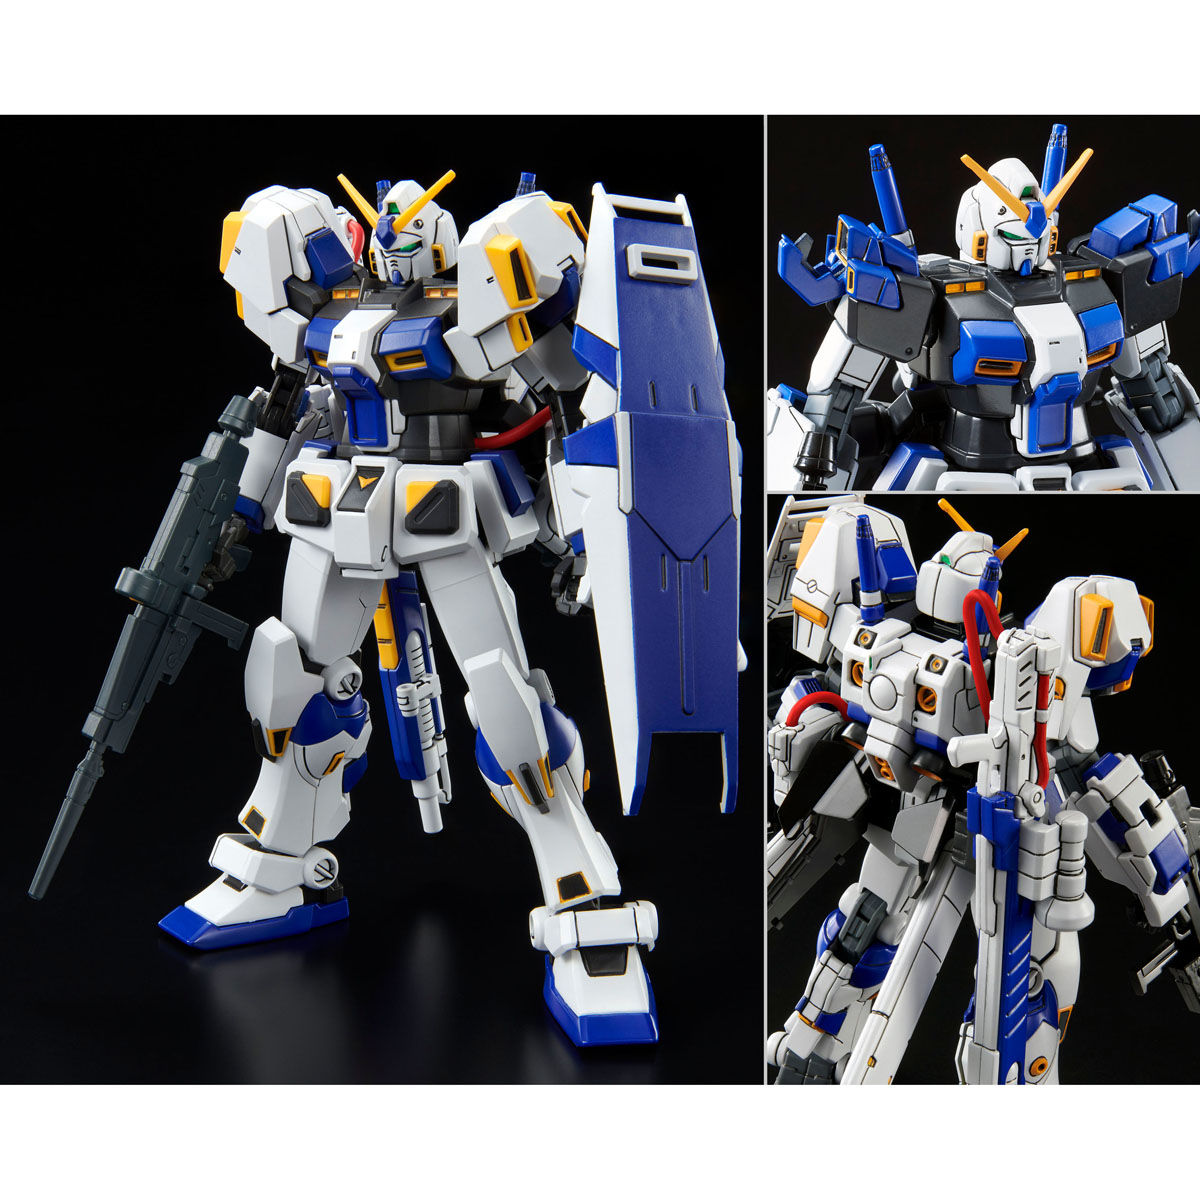 HG 1/144 GUNDAM G04  [Sep 2020 Delivery]